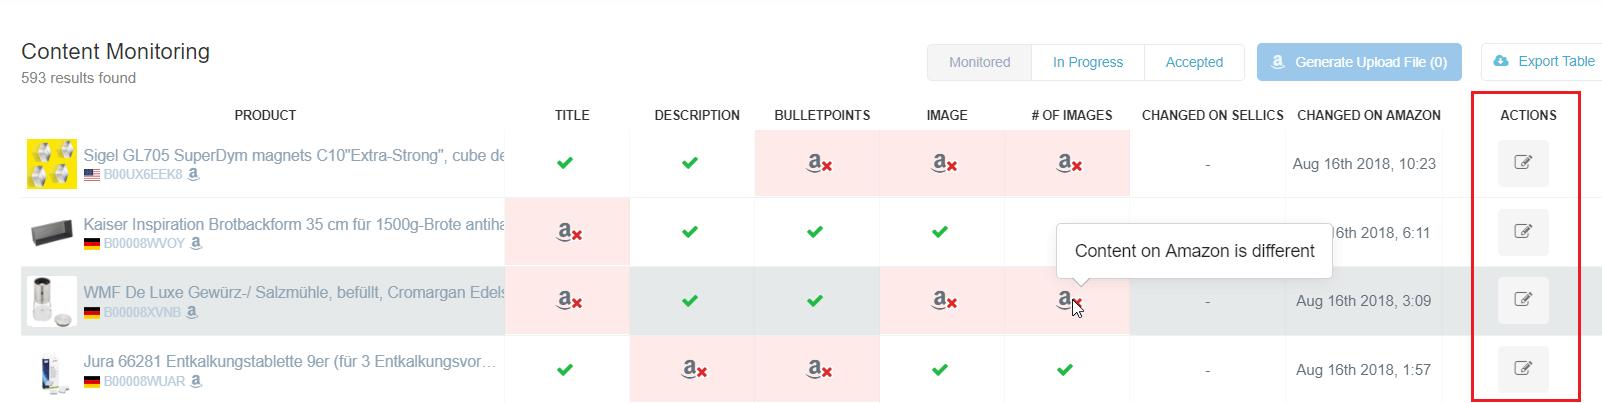 sellics amazon vendor content monitoring